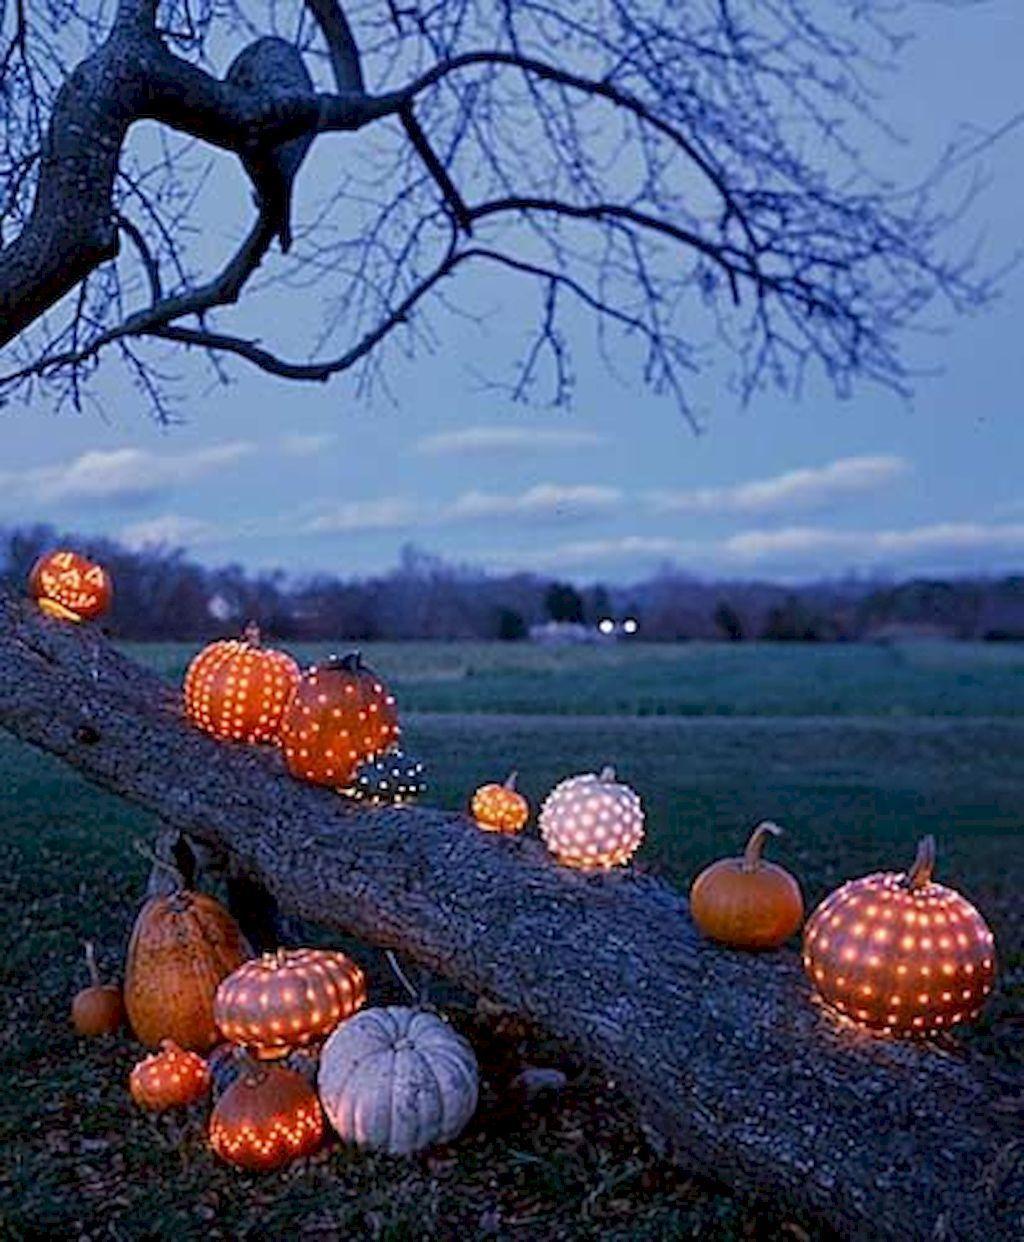 Halloween Outdoor Decoration Ideas 2020 80 + CREEPY OUTDOOR HALLOWEEN DECORATION IDEAS (33) | October 10